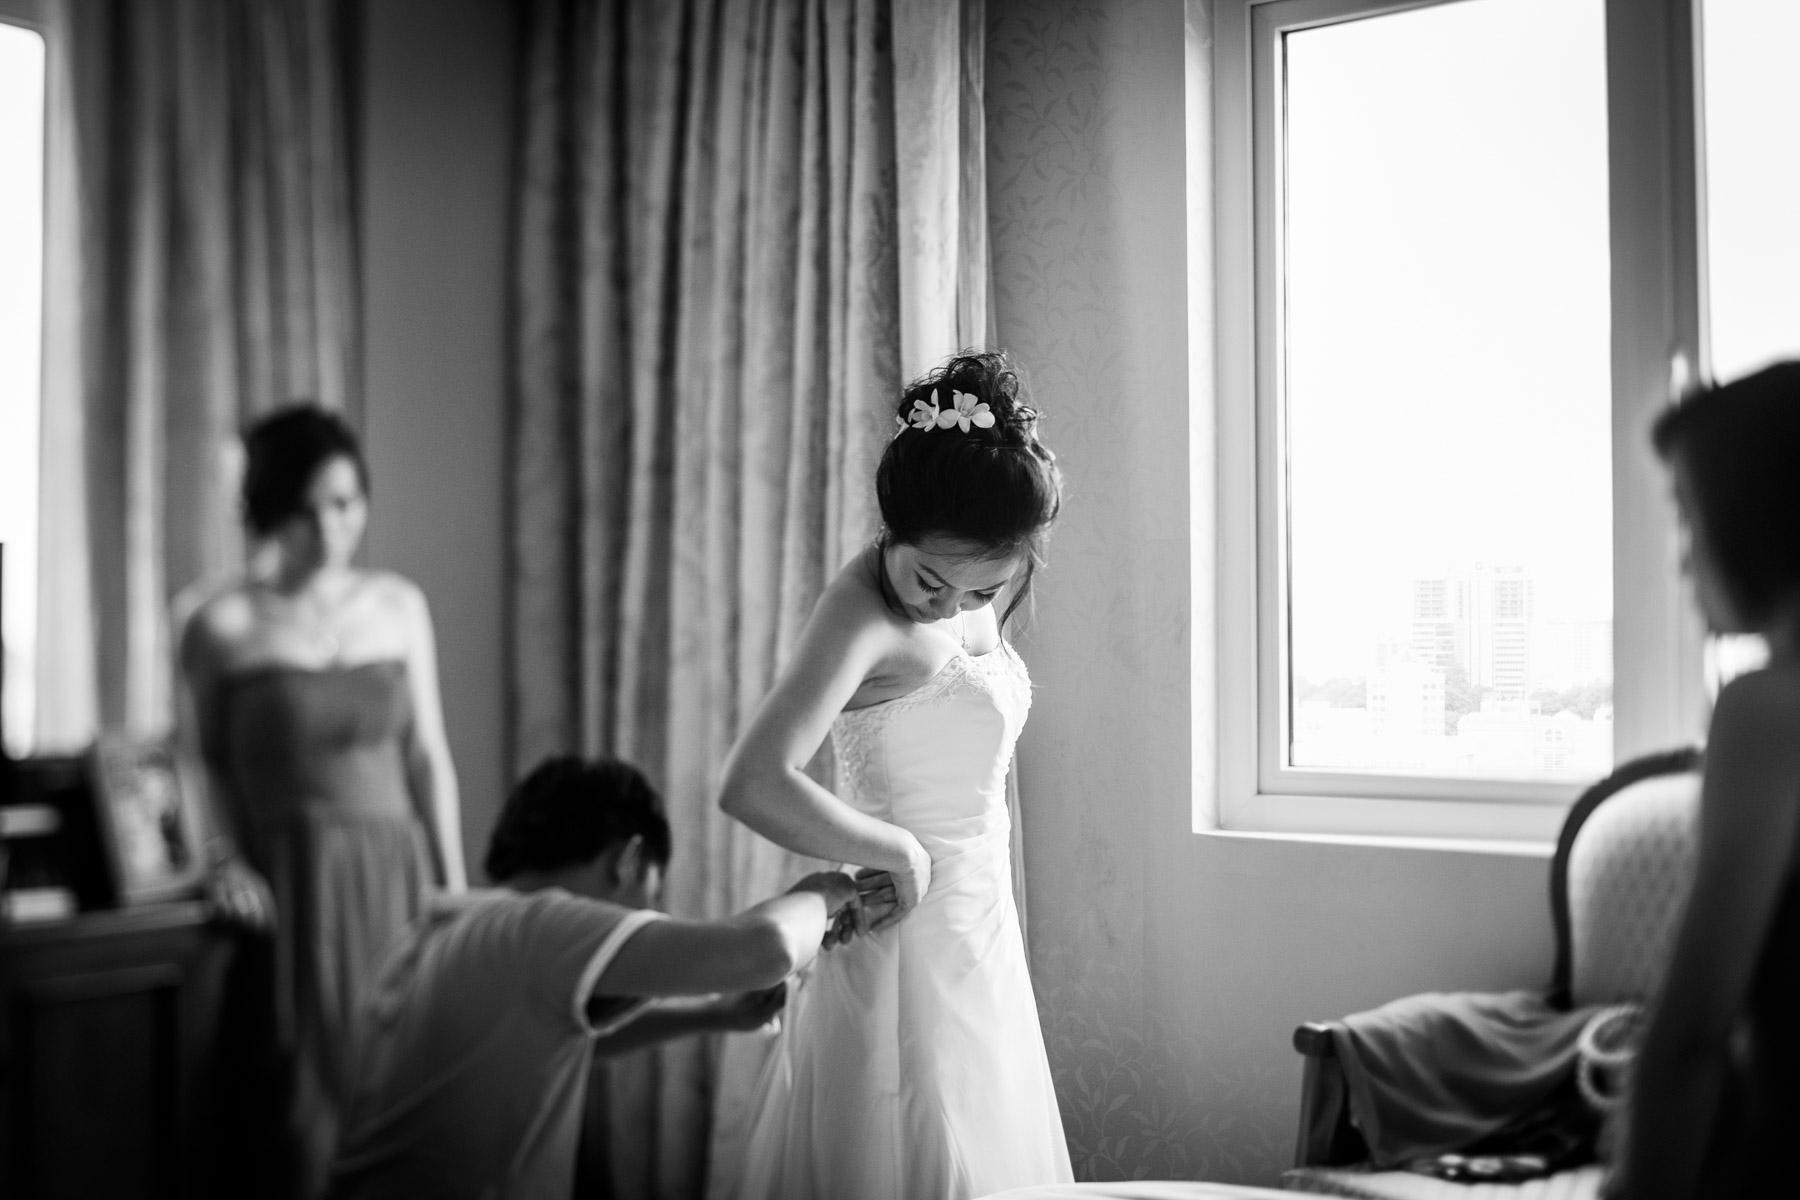 Thailand-Wedding-Photography-Getting-Ready-37